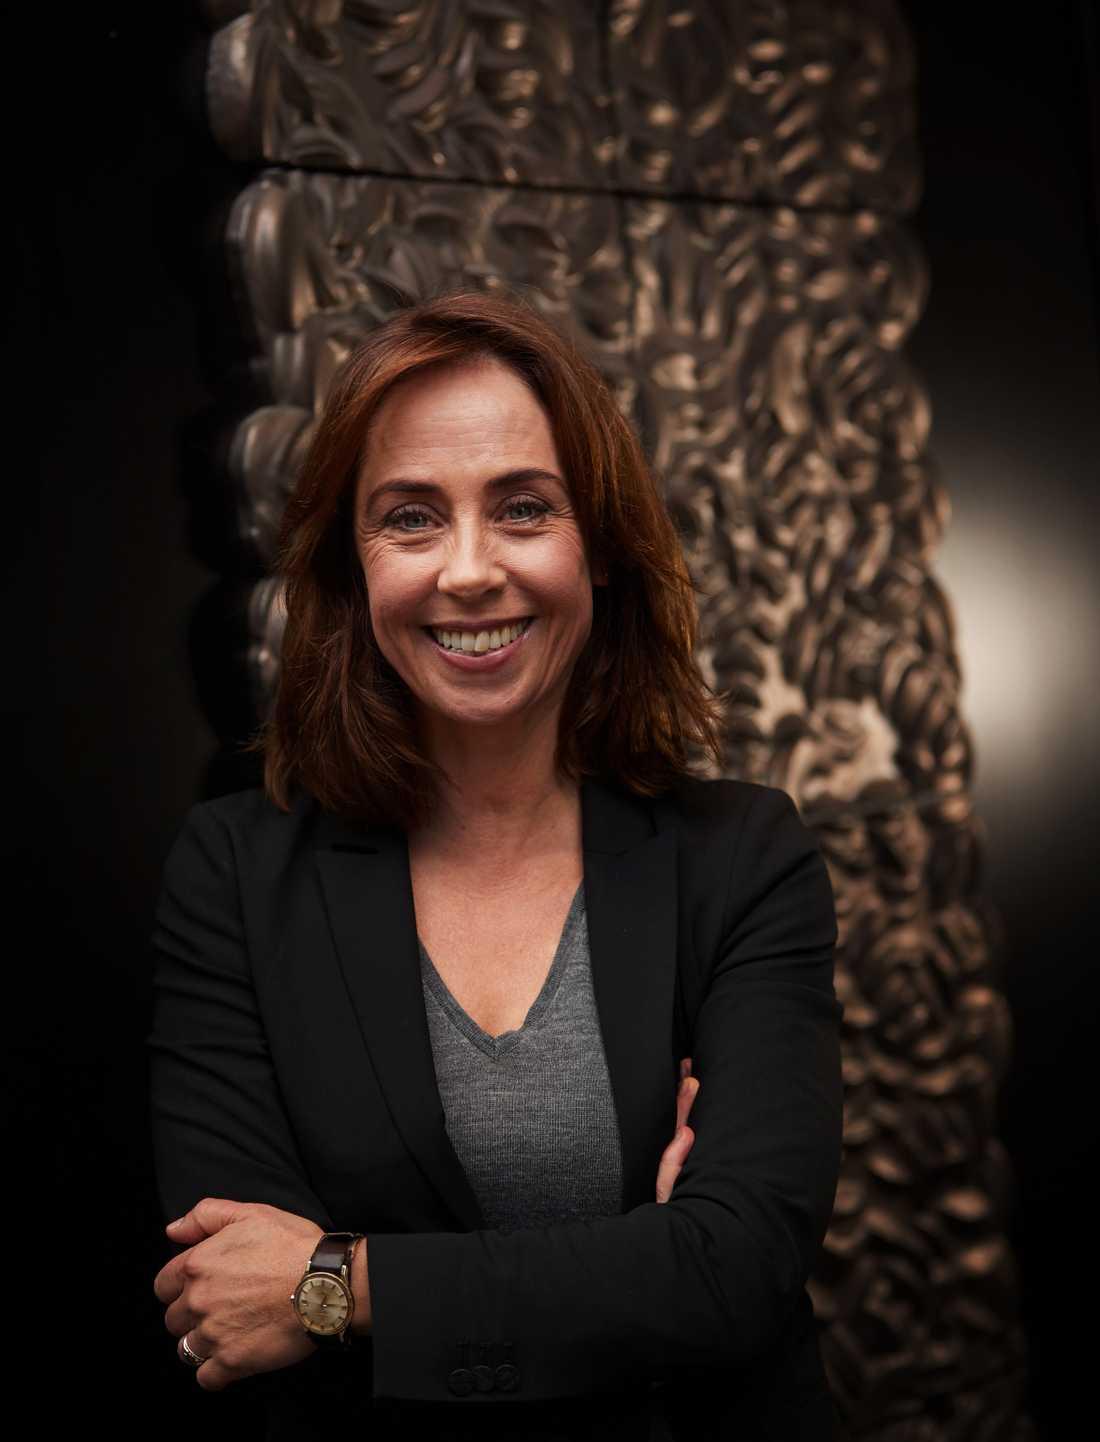 Sofie Gråbøl.